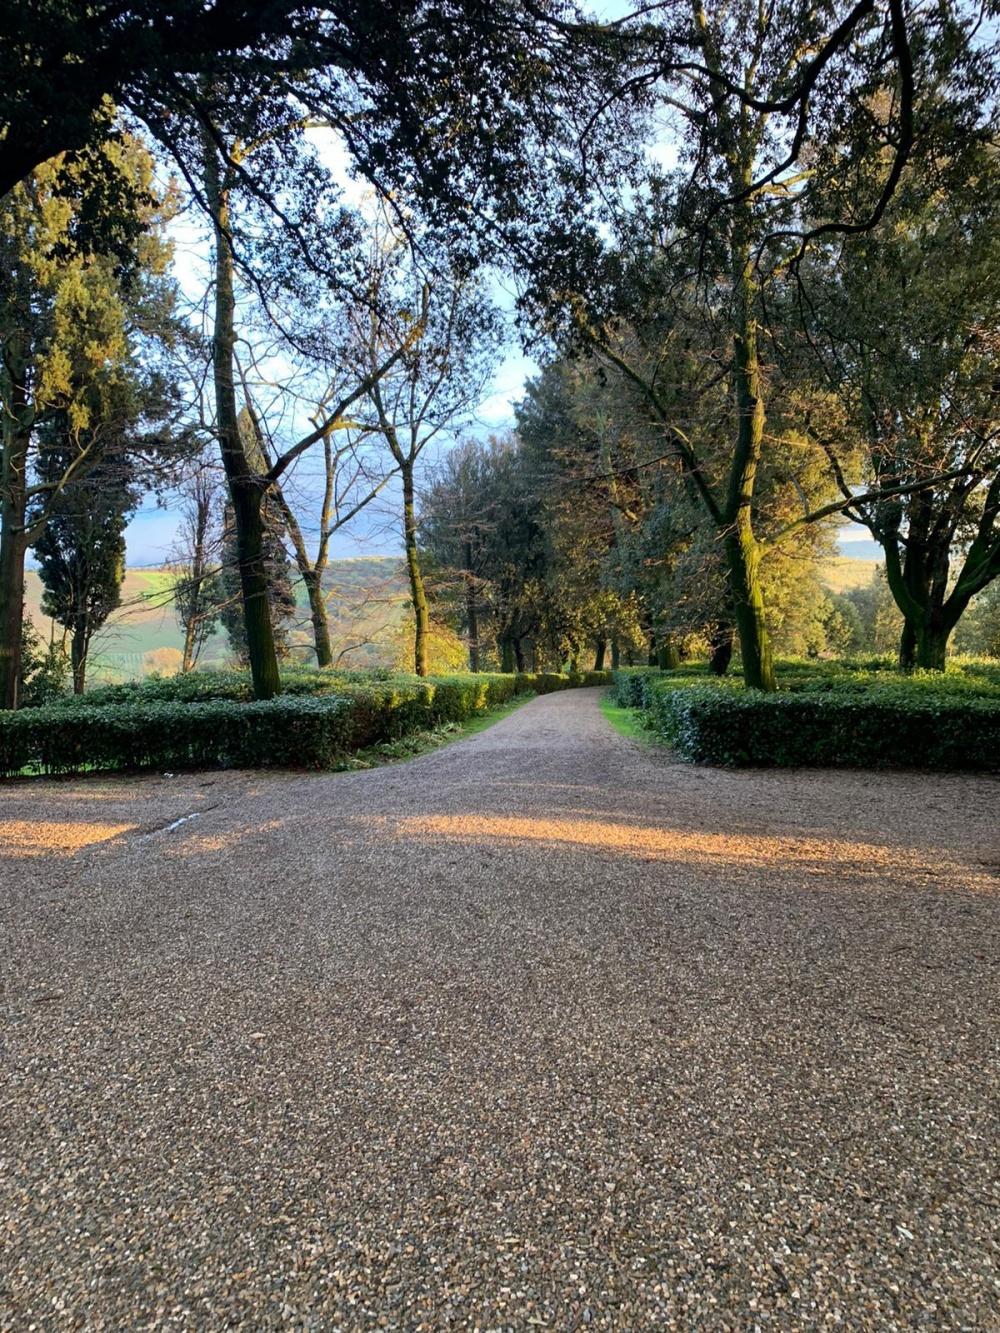 entrance of a villa in tuscany